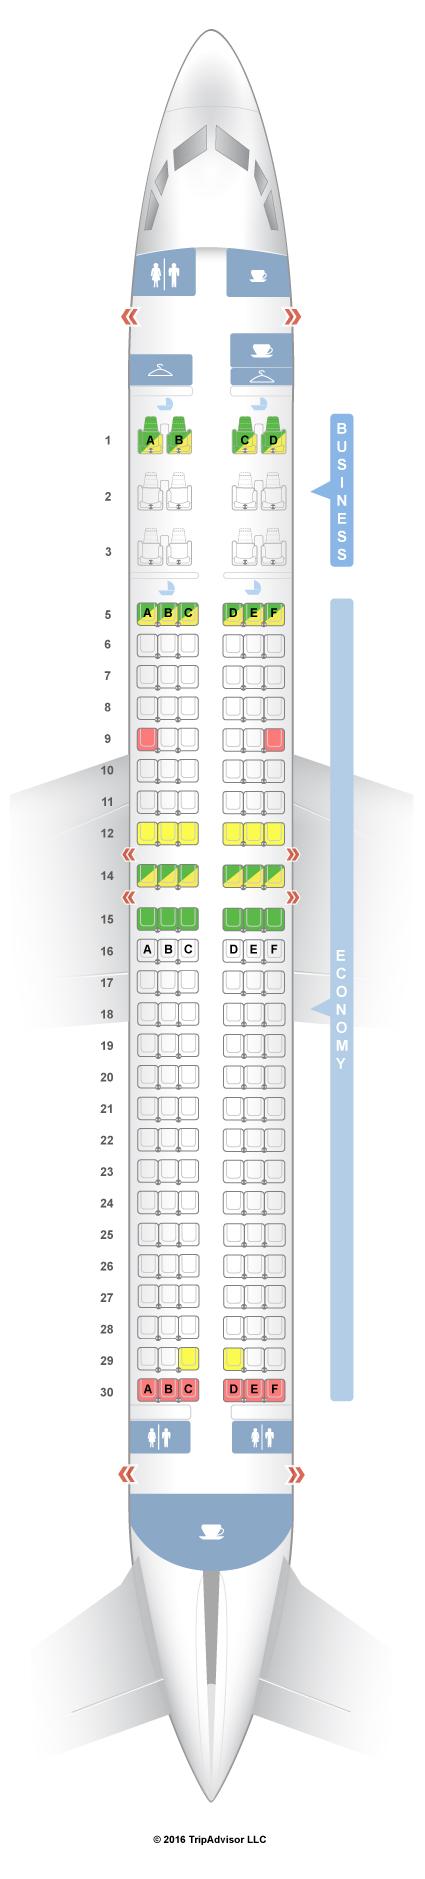 SeatGuru Seat Map Silkair Boeing 737-800 (738)